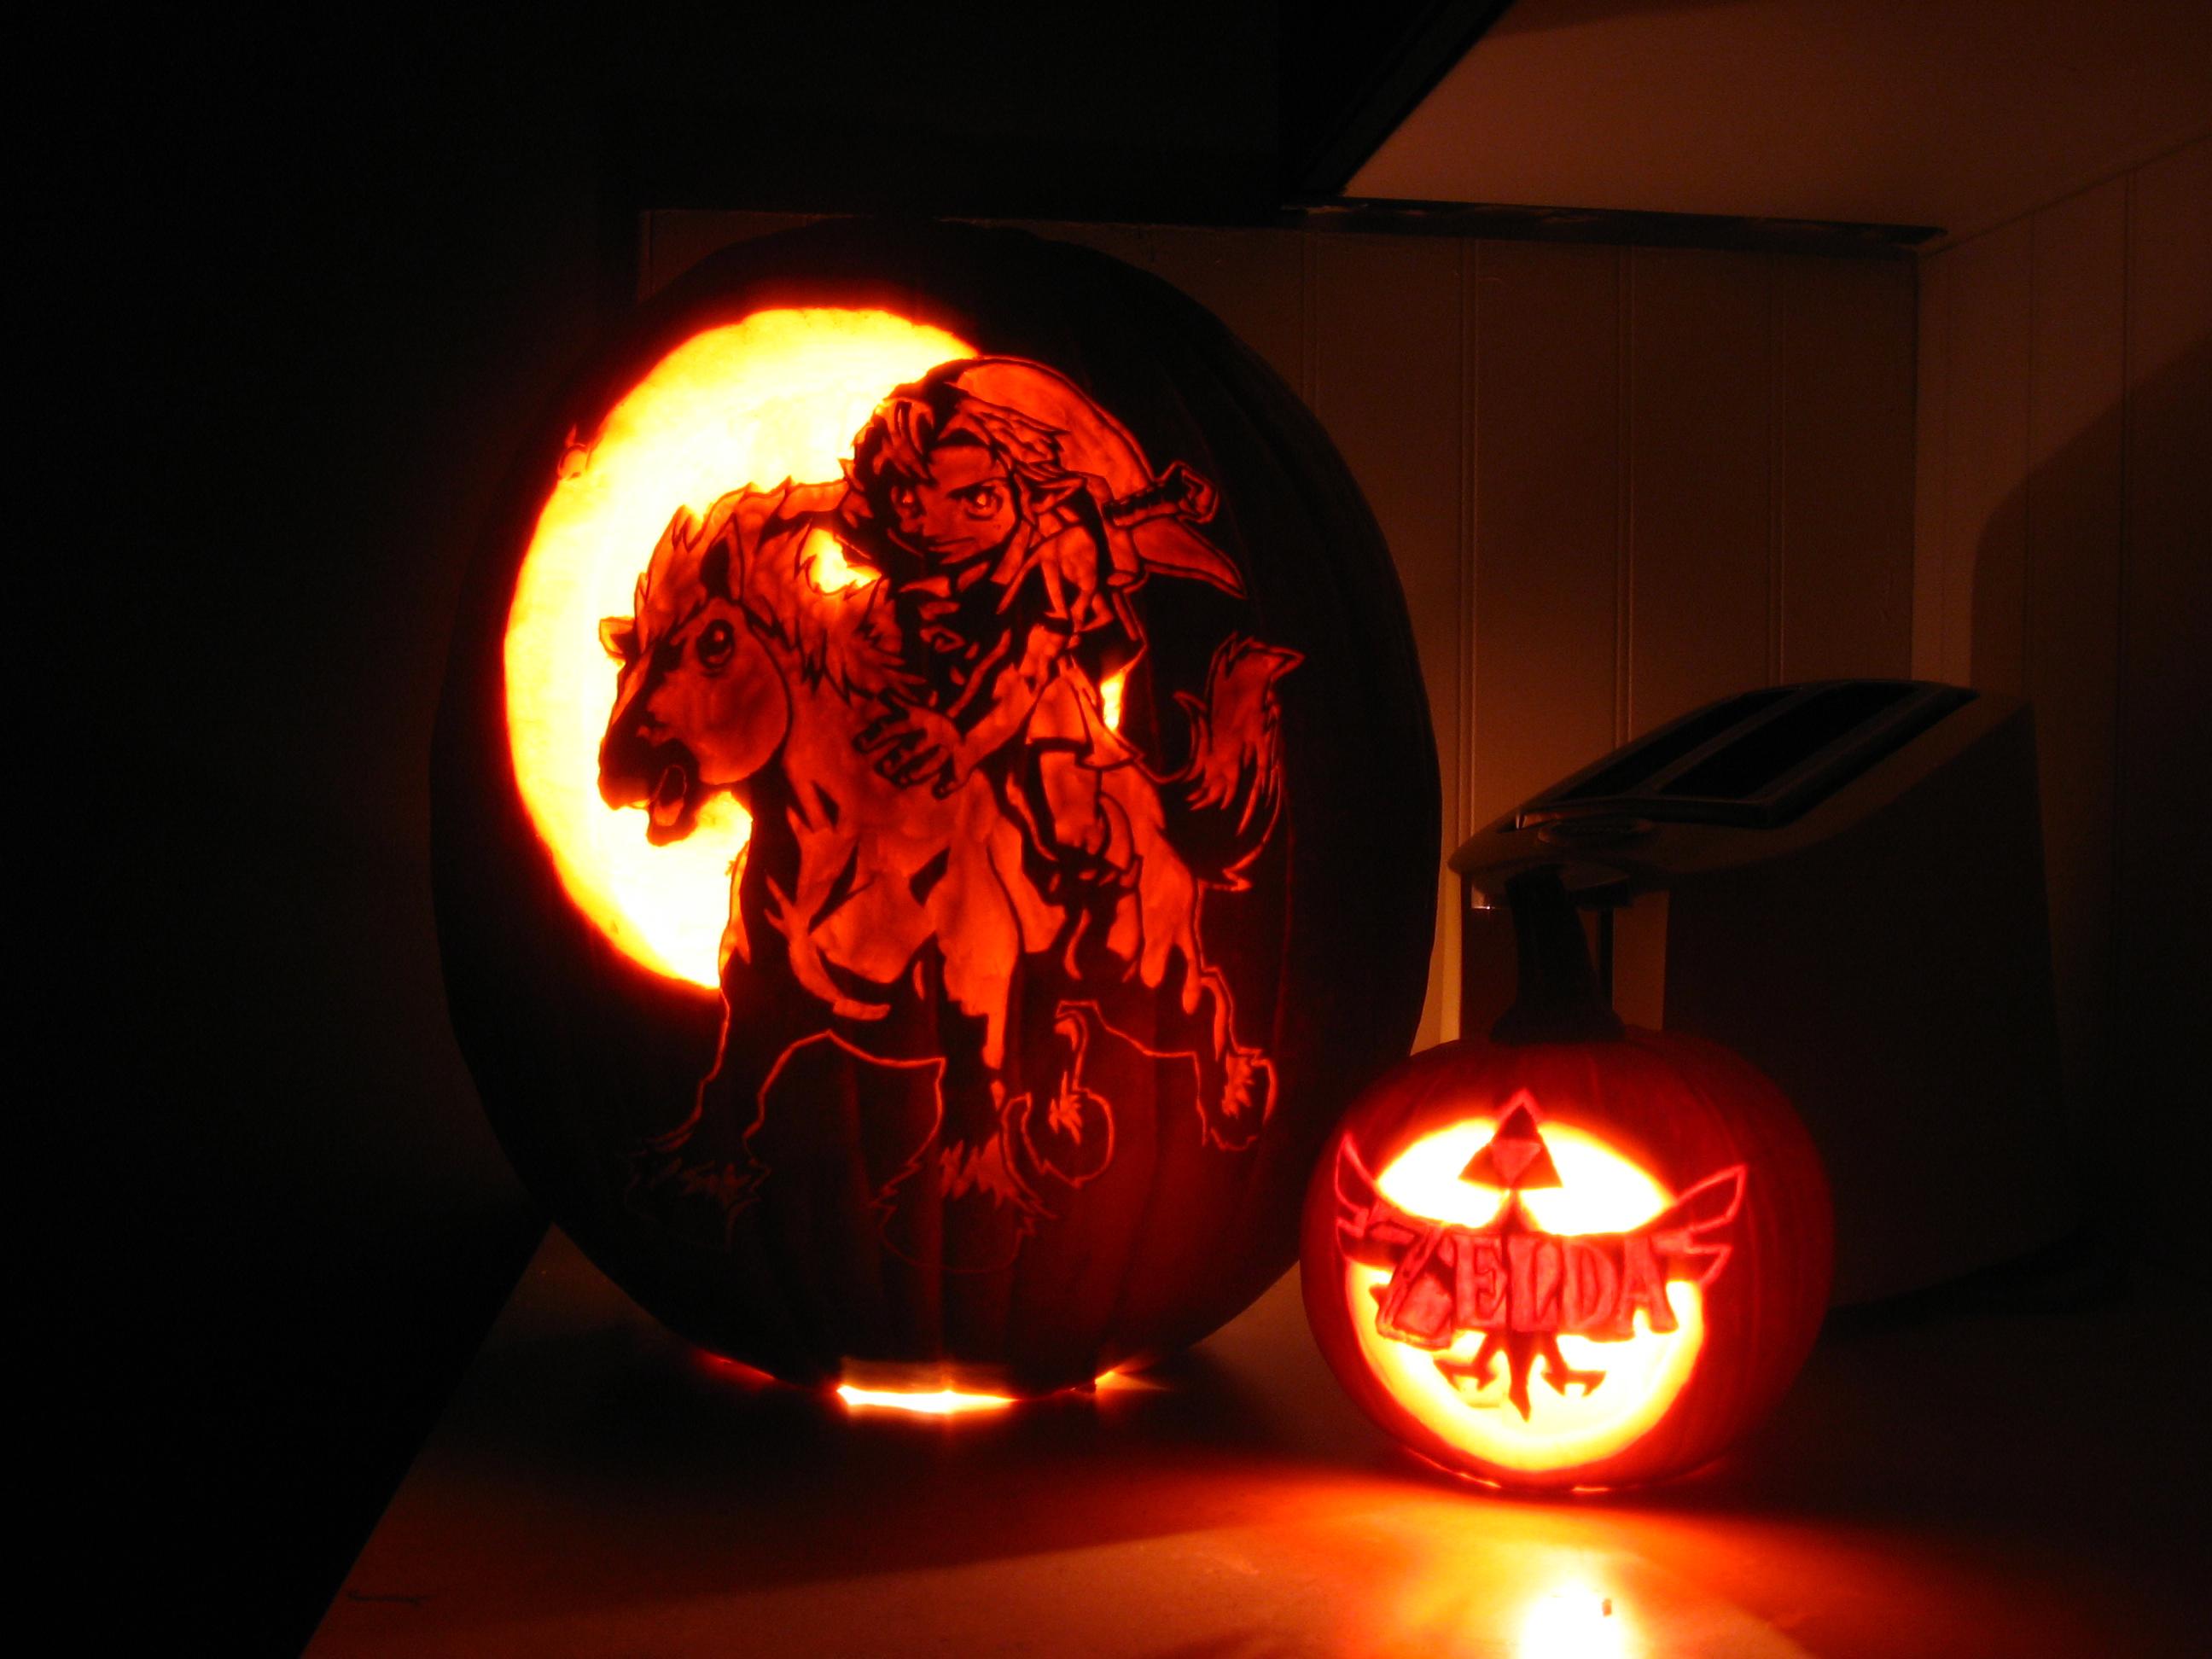 The legend of zelda smith pumpkin carver